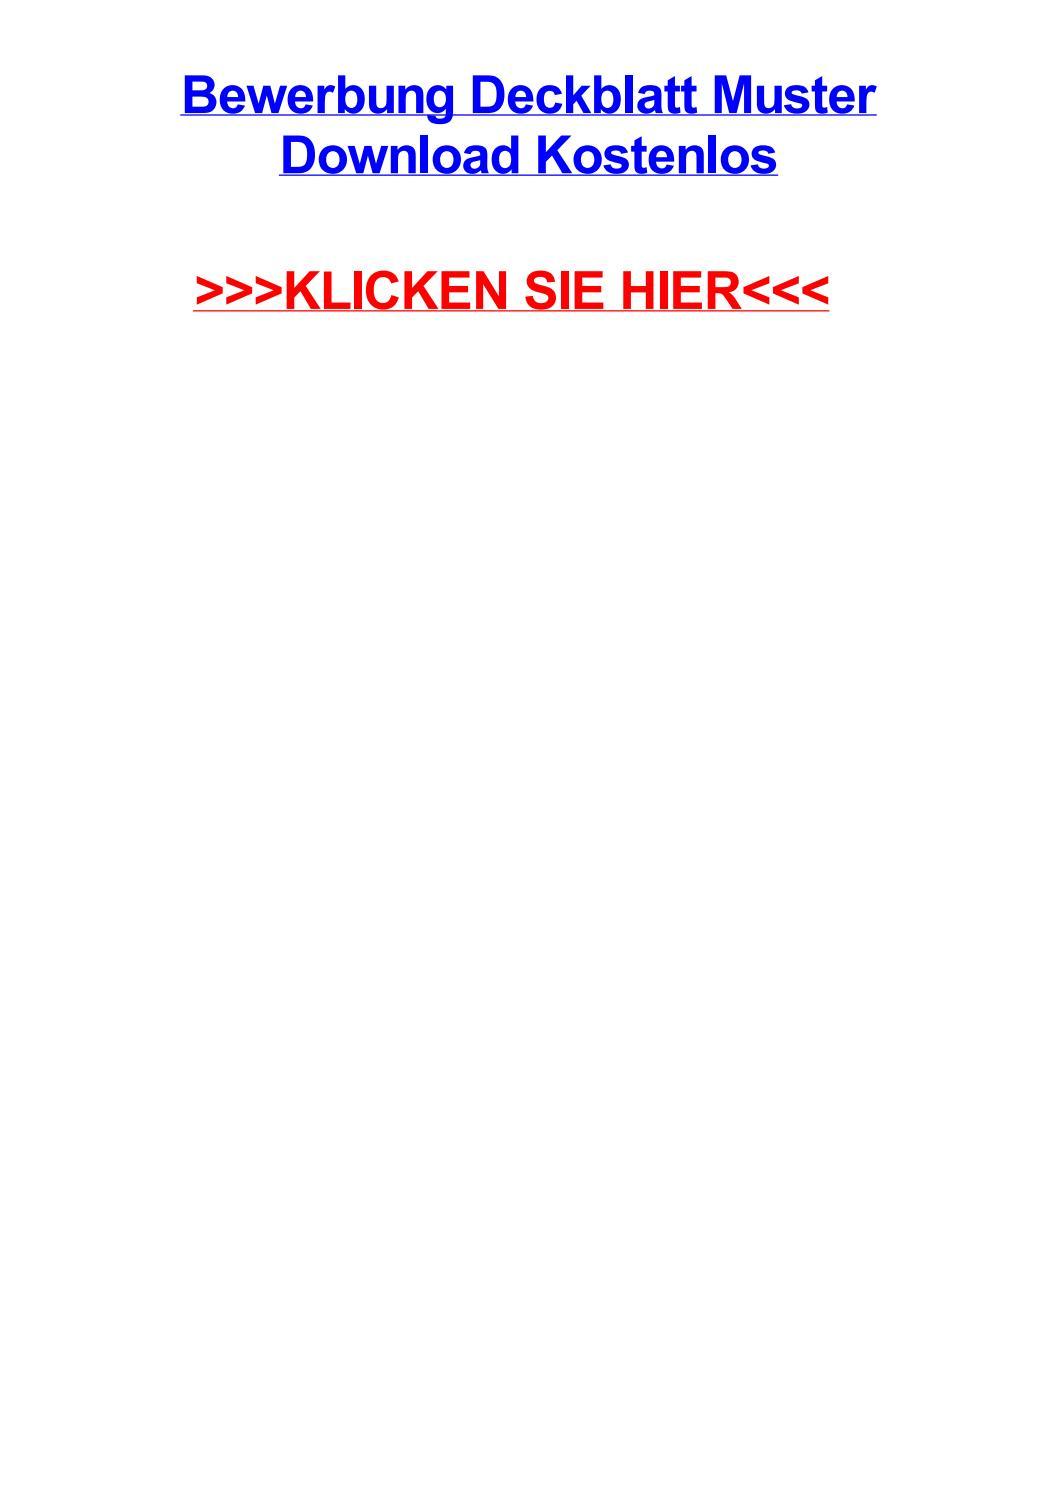 bewerbung deckblatt muster download kostenlos by davidiwge issuu. Black Bedroom Furniture Sets. Home Design Ideas